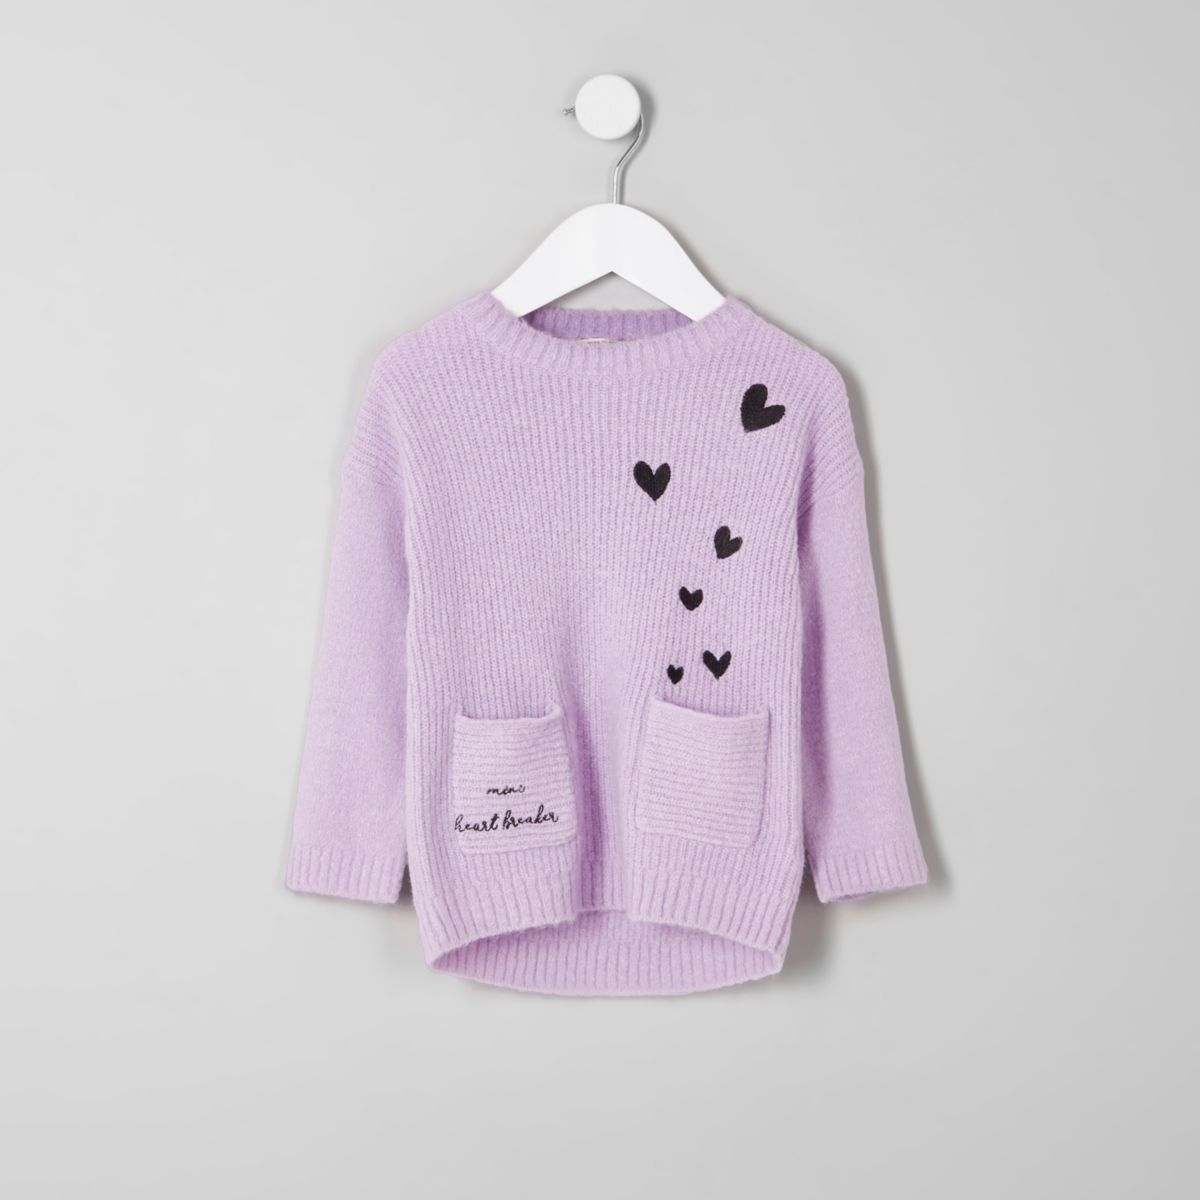 Mini girls 'mini heart breaker' knit sweater